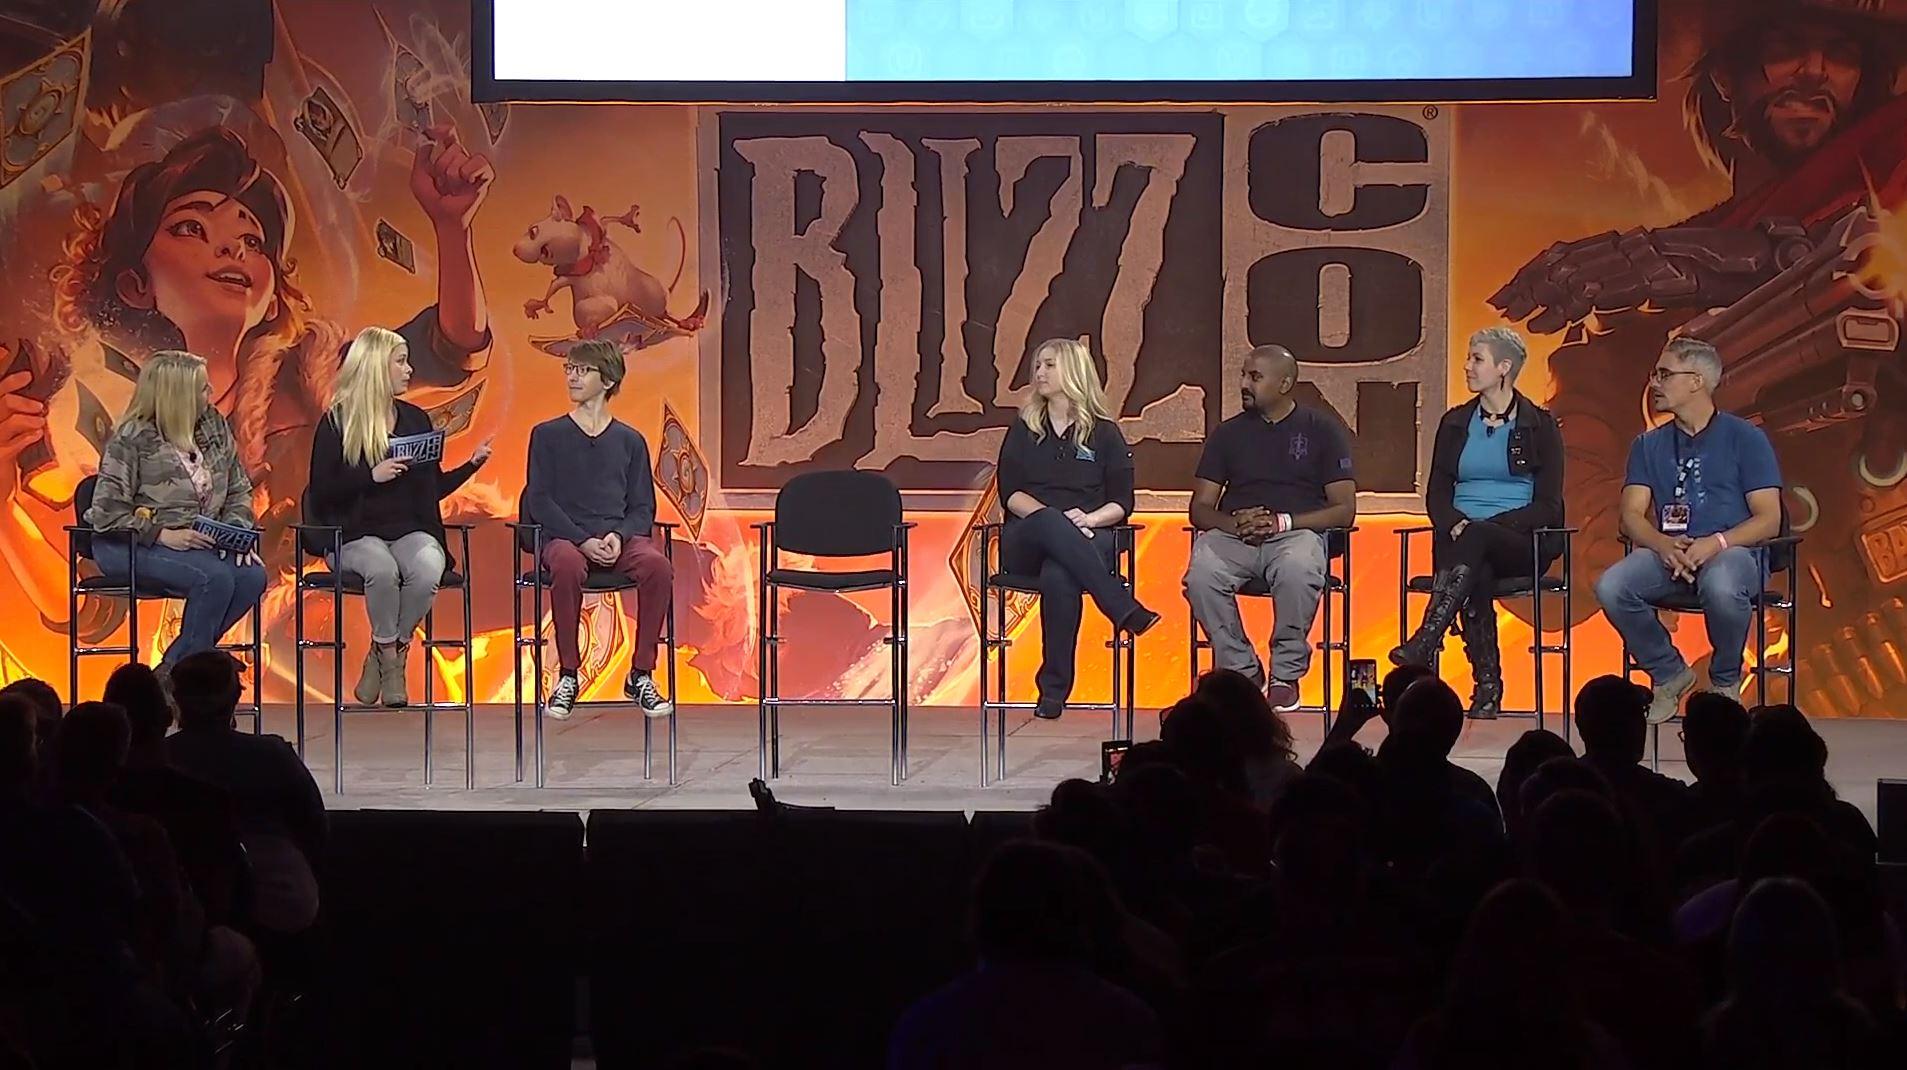 [#BLIZZCON2018] Resumen de algunos paneles sobre Blizzard